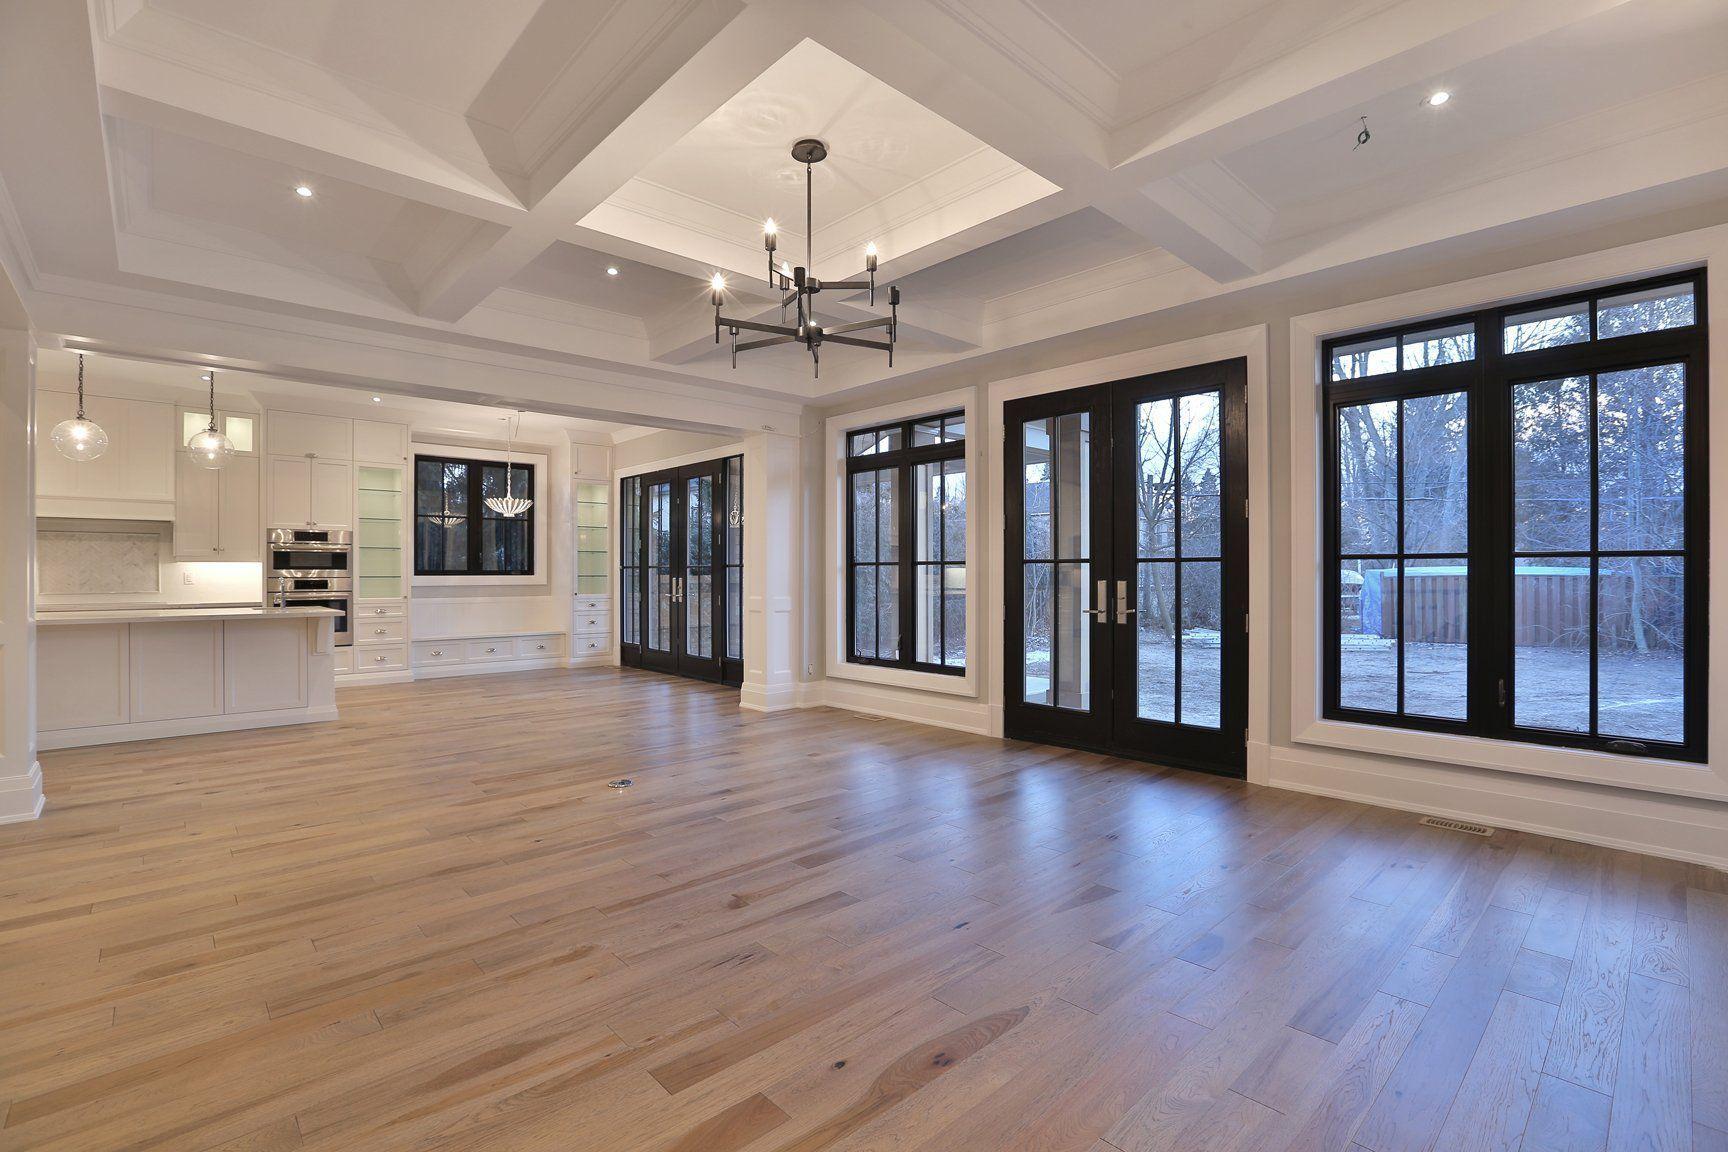 23 Impressive French Living Room Design Ideas